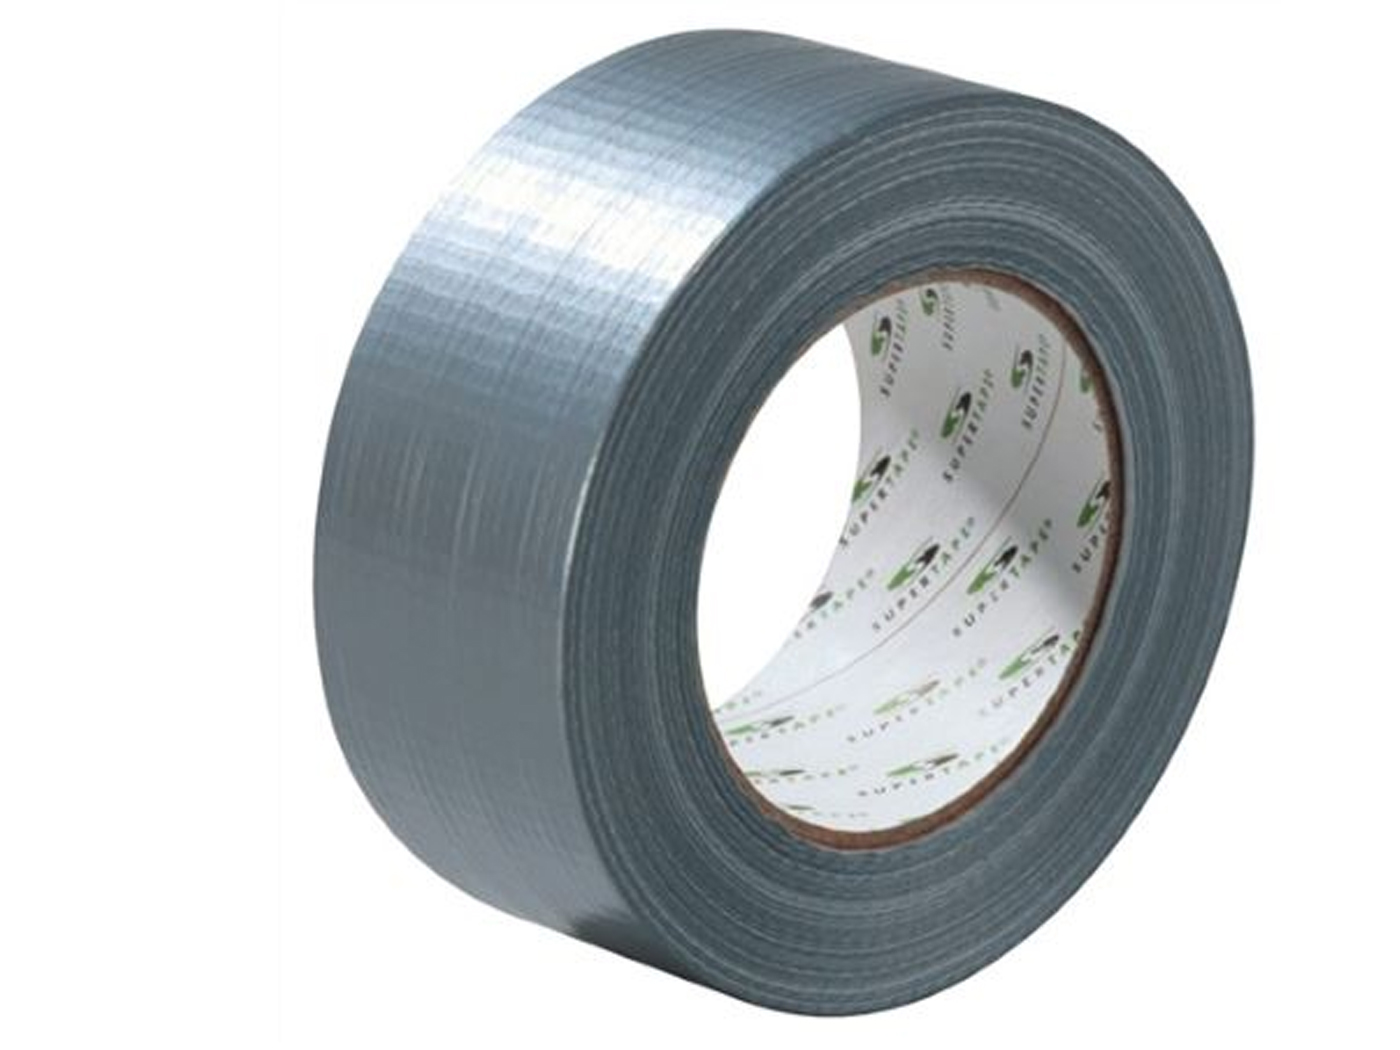 Plakband Superduct ST311 zilver | DKMTools - DKM Tools